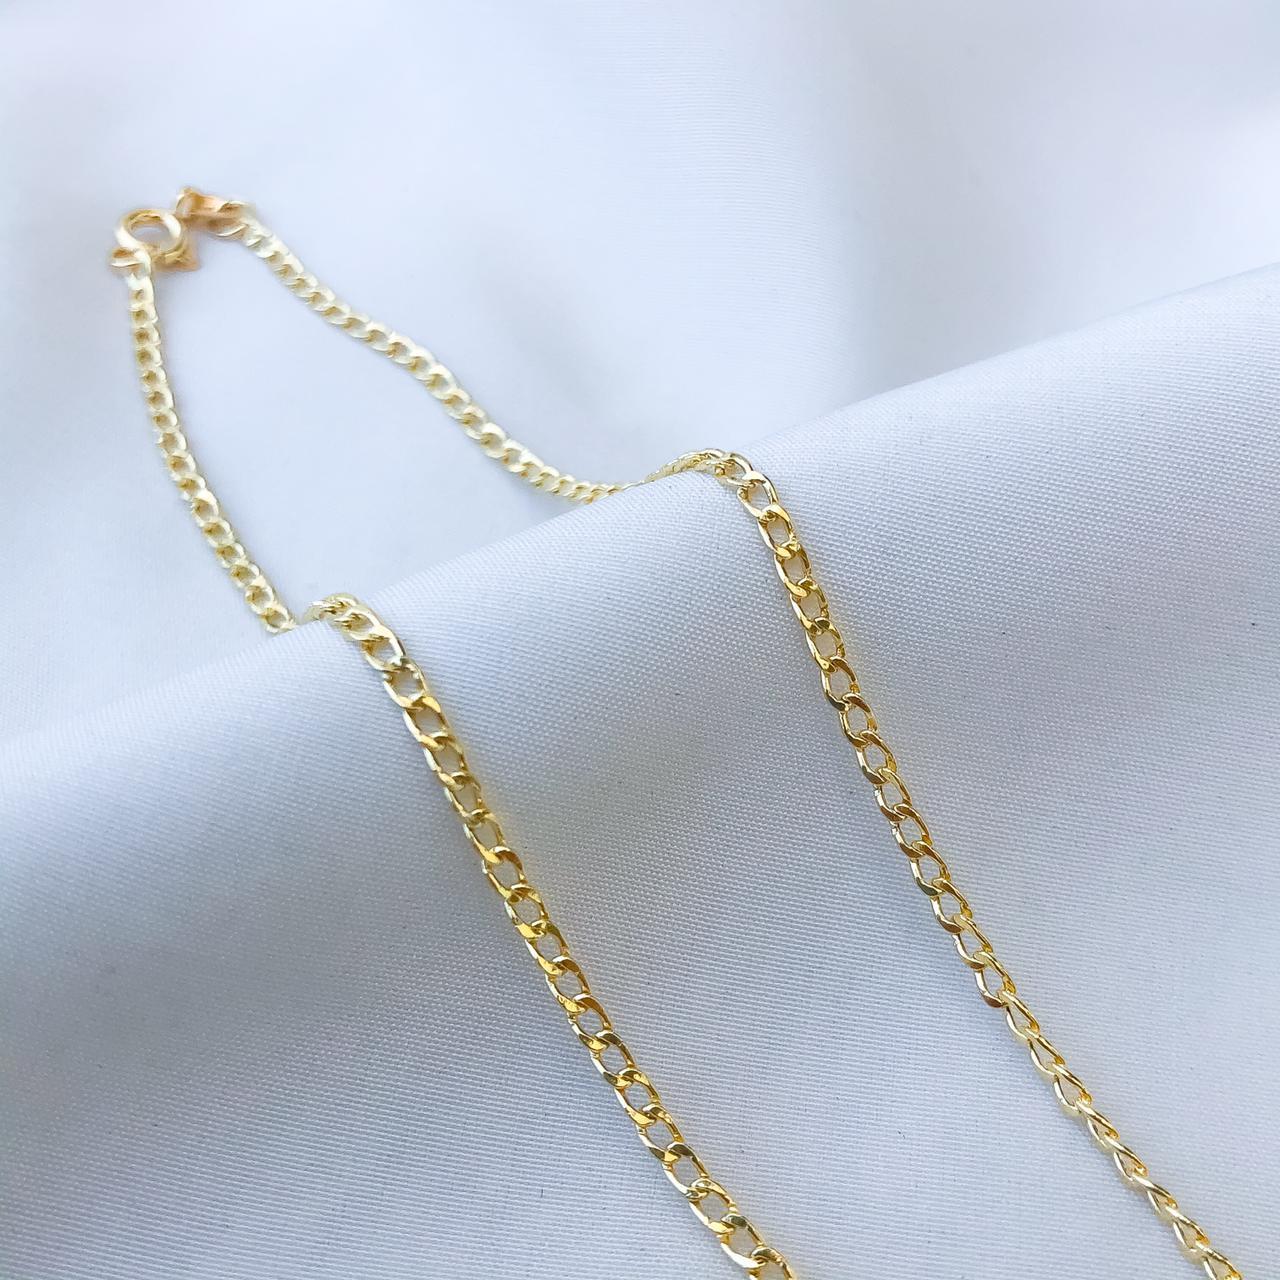 Corrente Groumet Curto em Ouro 18K 60cm